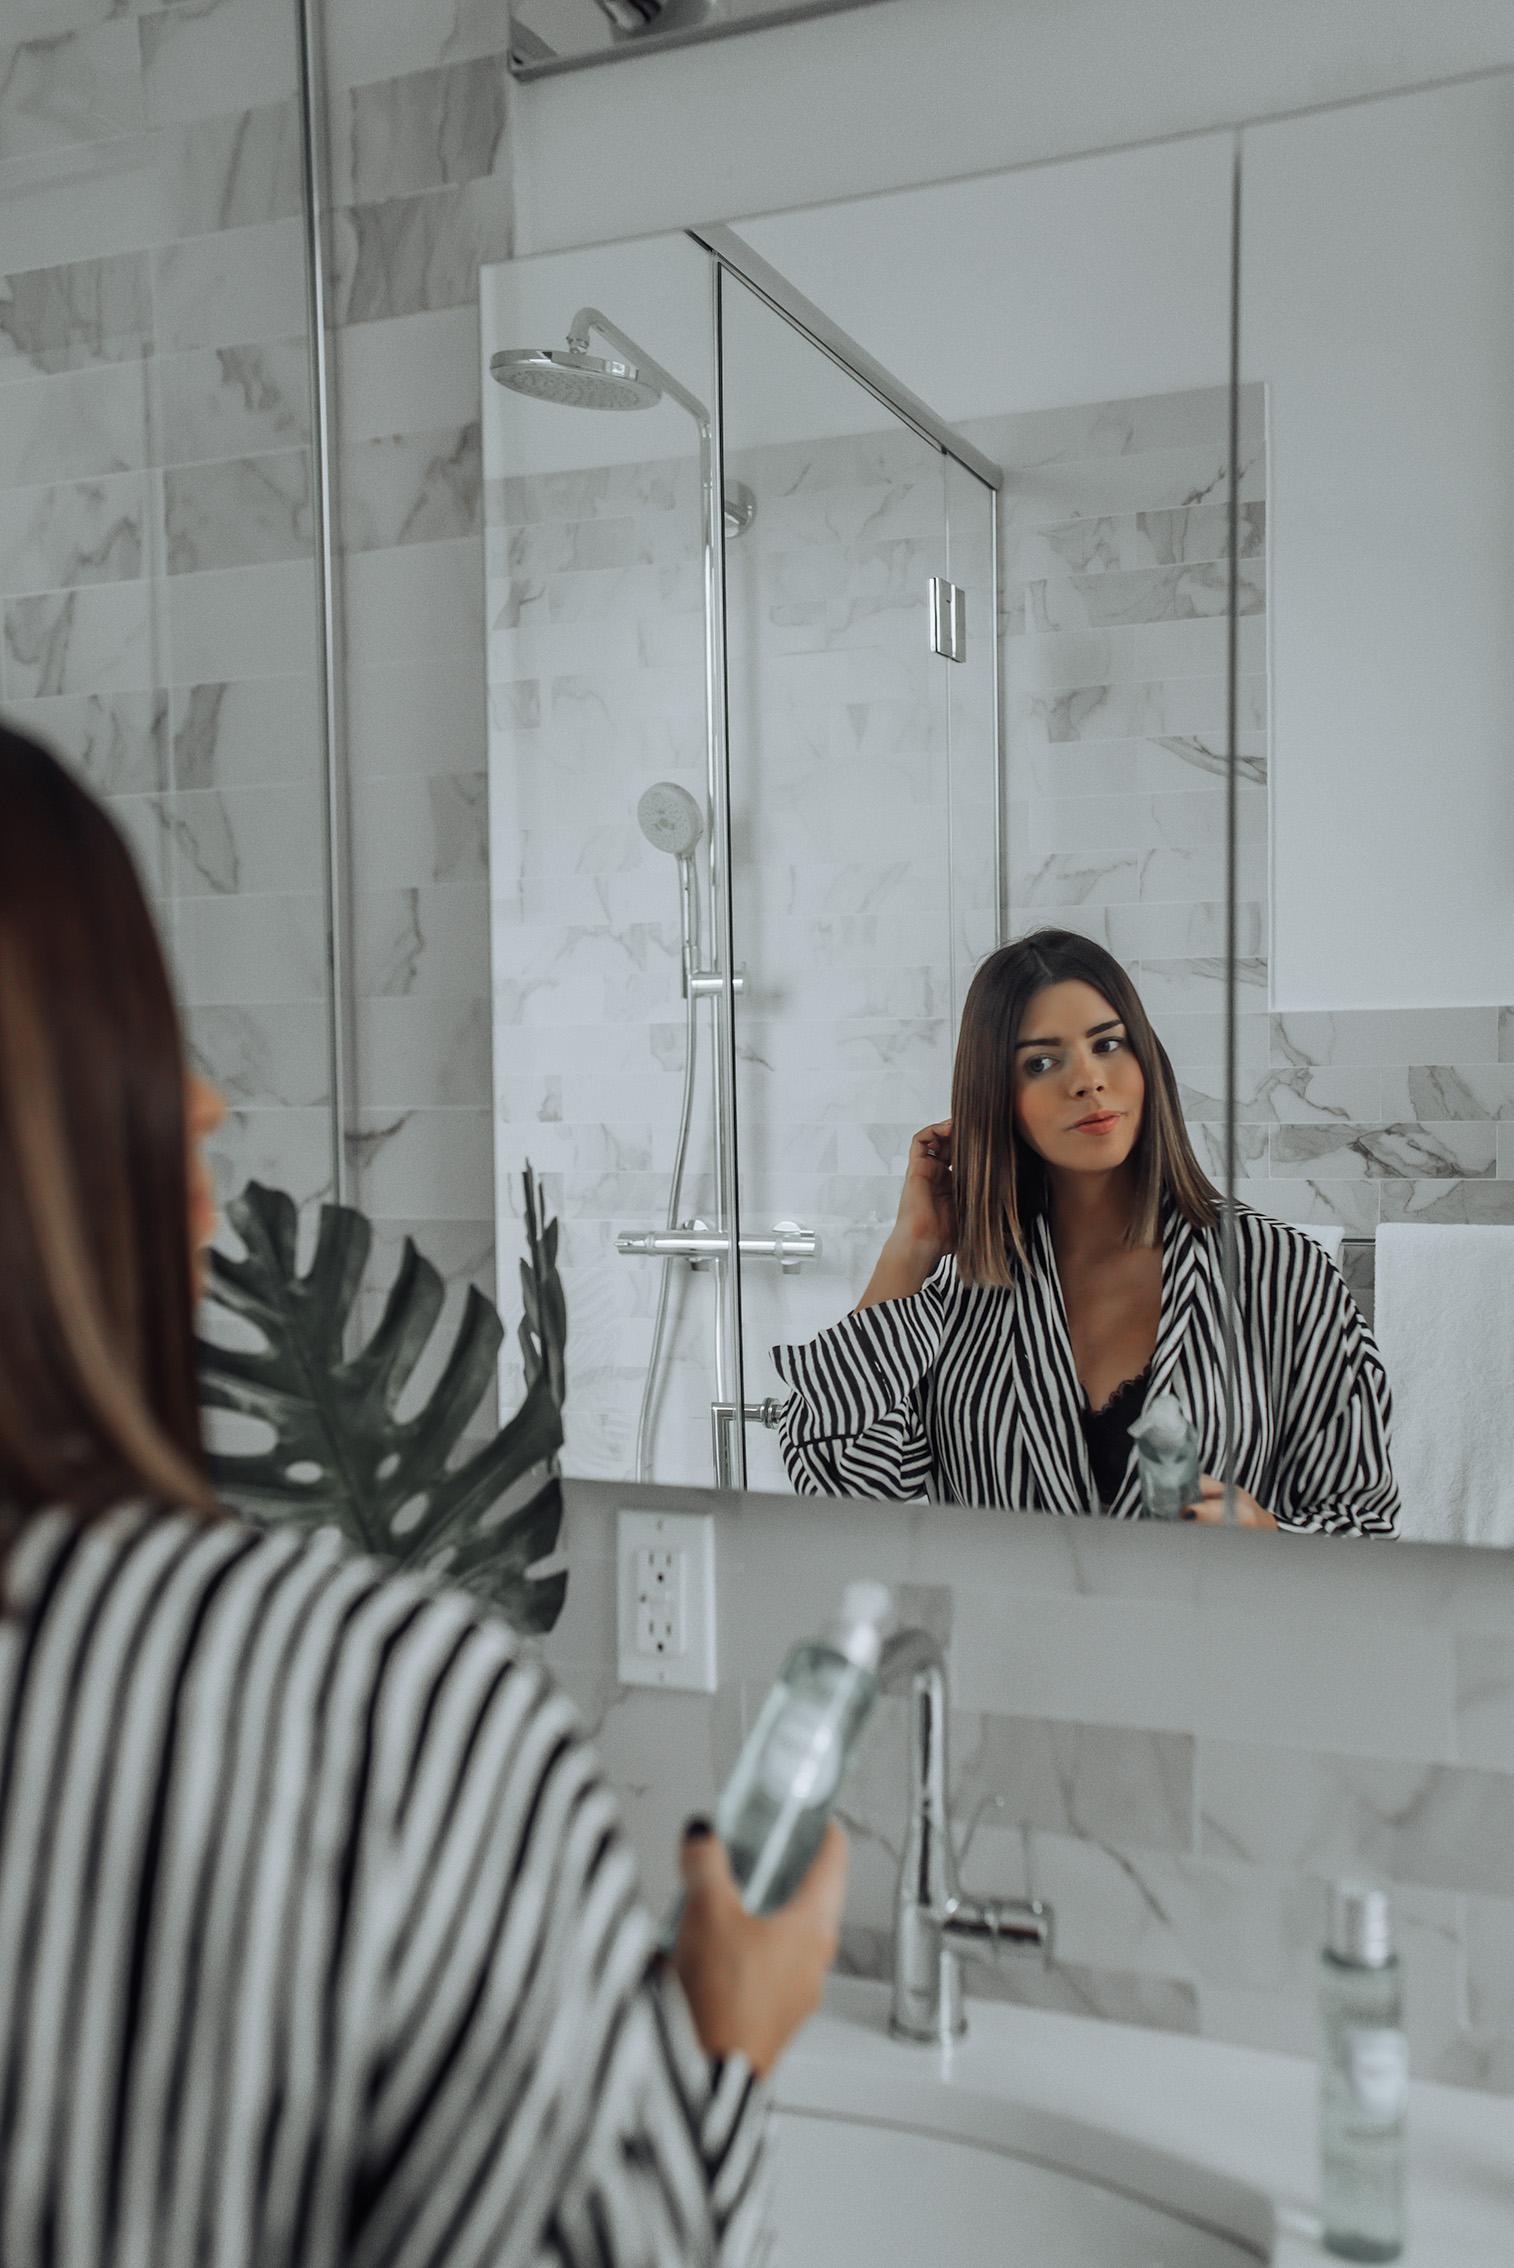 Reset your skincare with L'Occitane  Aqua Reotier Water Gel Cleanser   Aqua Reotier Moisture Prep Essence   Overnight Reset Oil-In-Serum #beautyproducts #pregnancysafeskincare